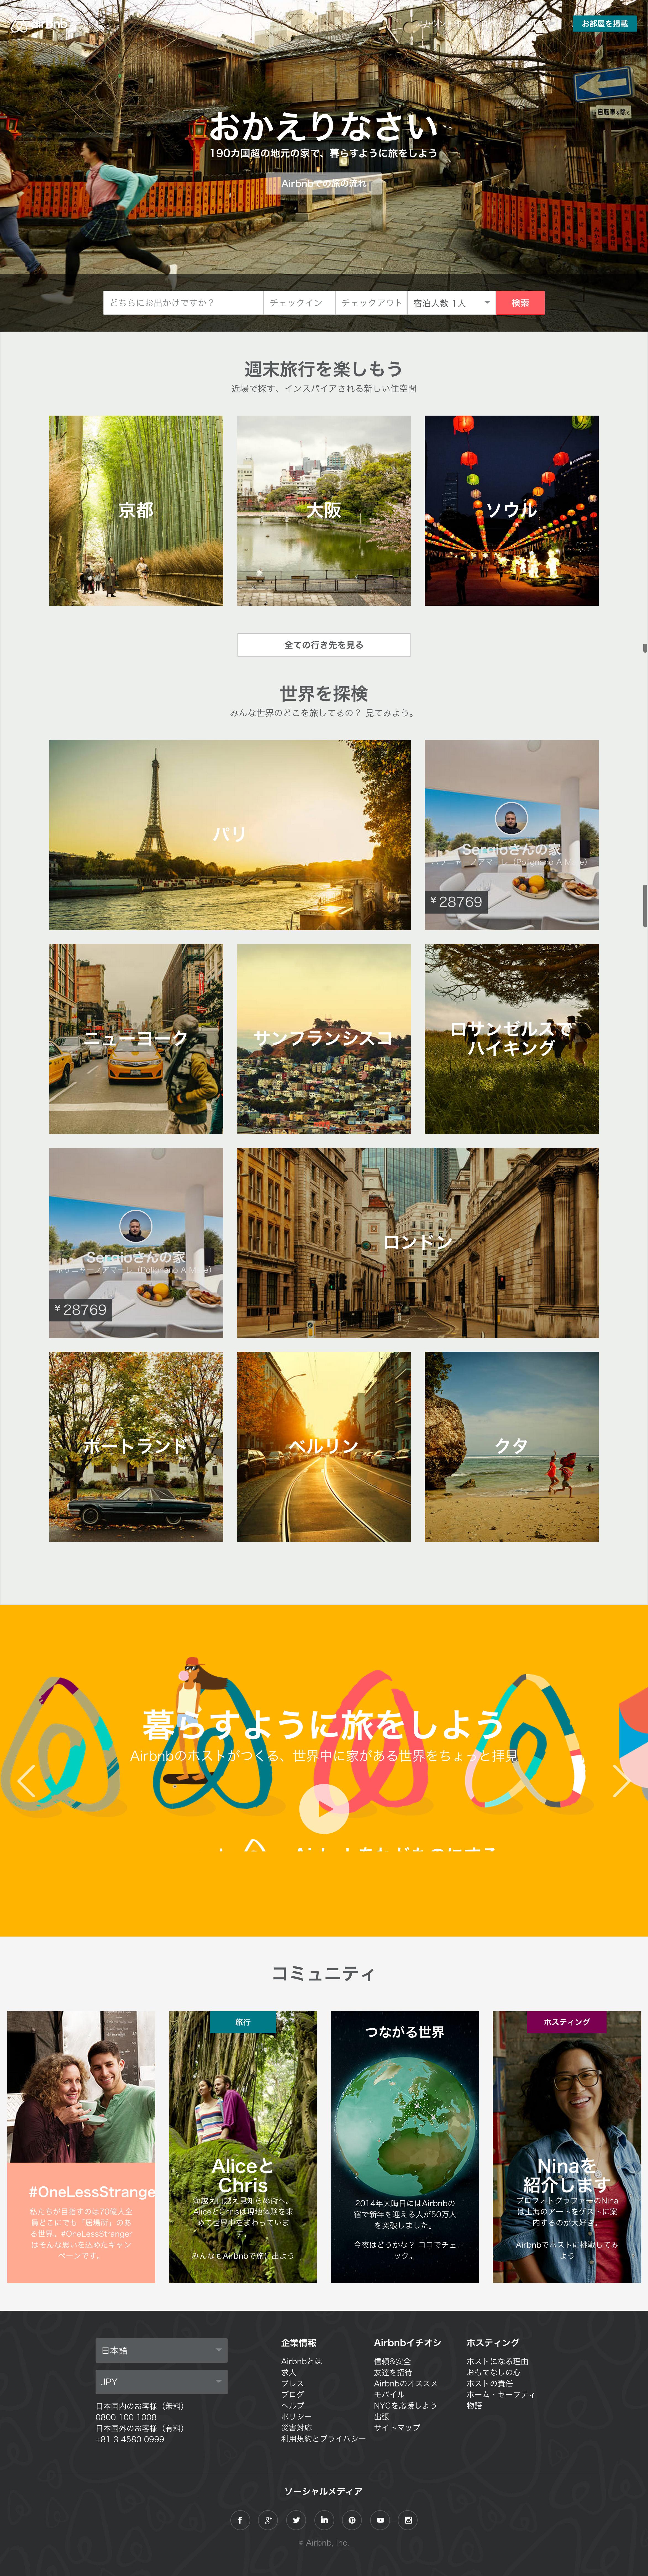 Airbnb (エアビーアンドビー、エアビーエンビー)は、宿泊施設を貸し出す人向けのウェブサイトです。